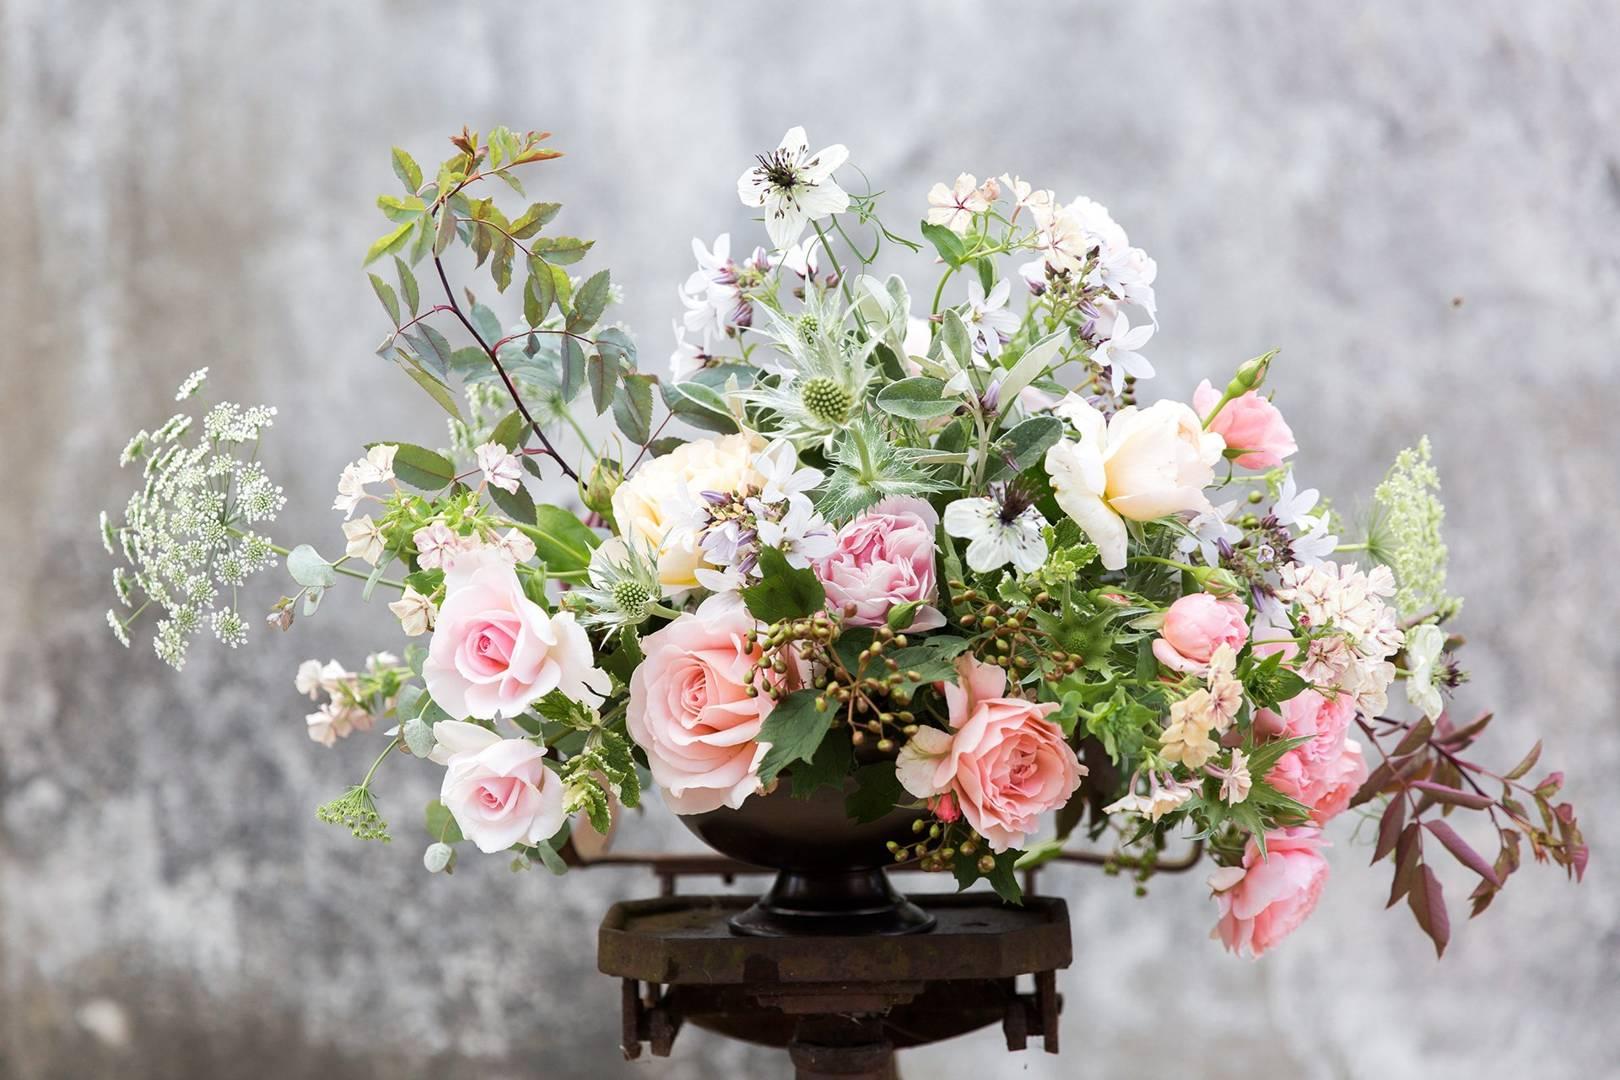 New year flowers- Shrub Roses